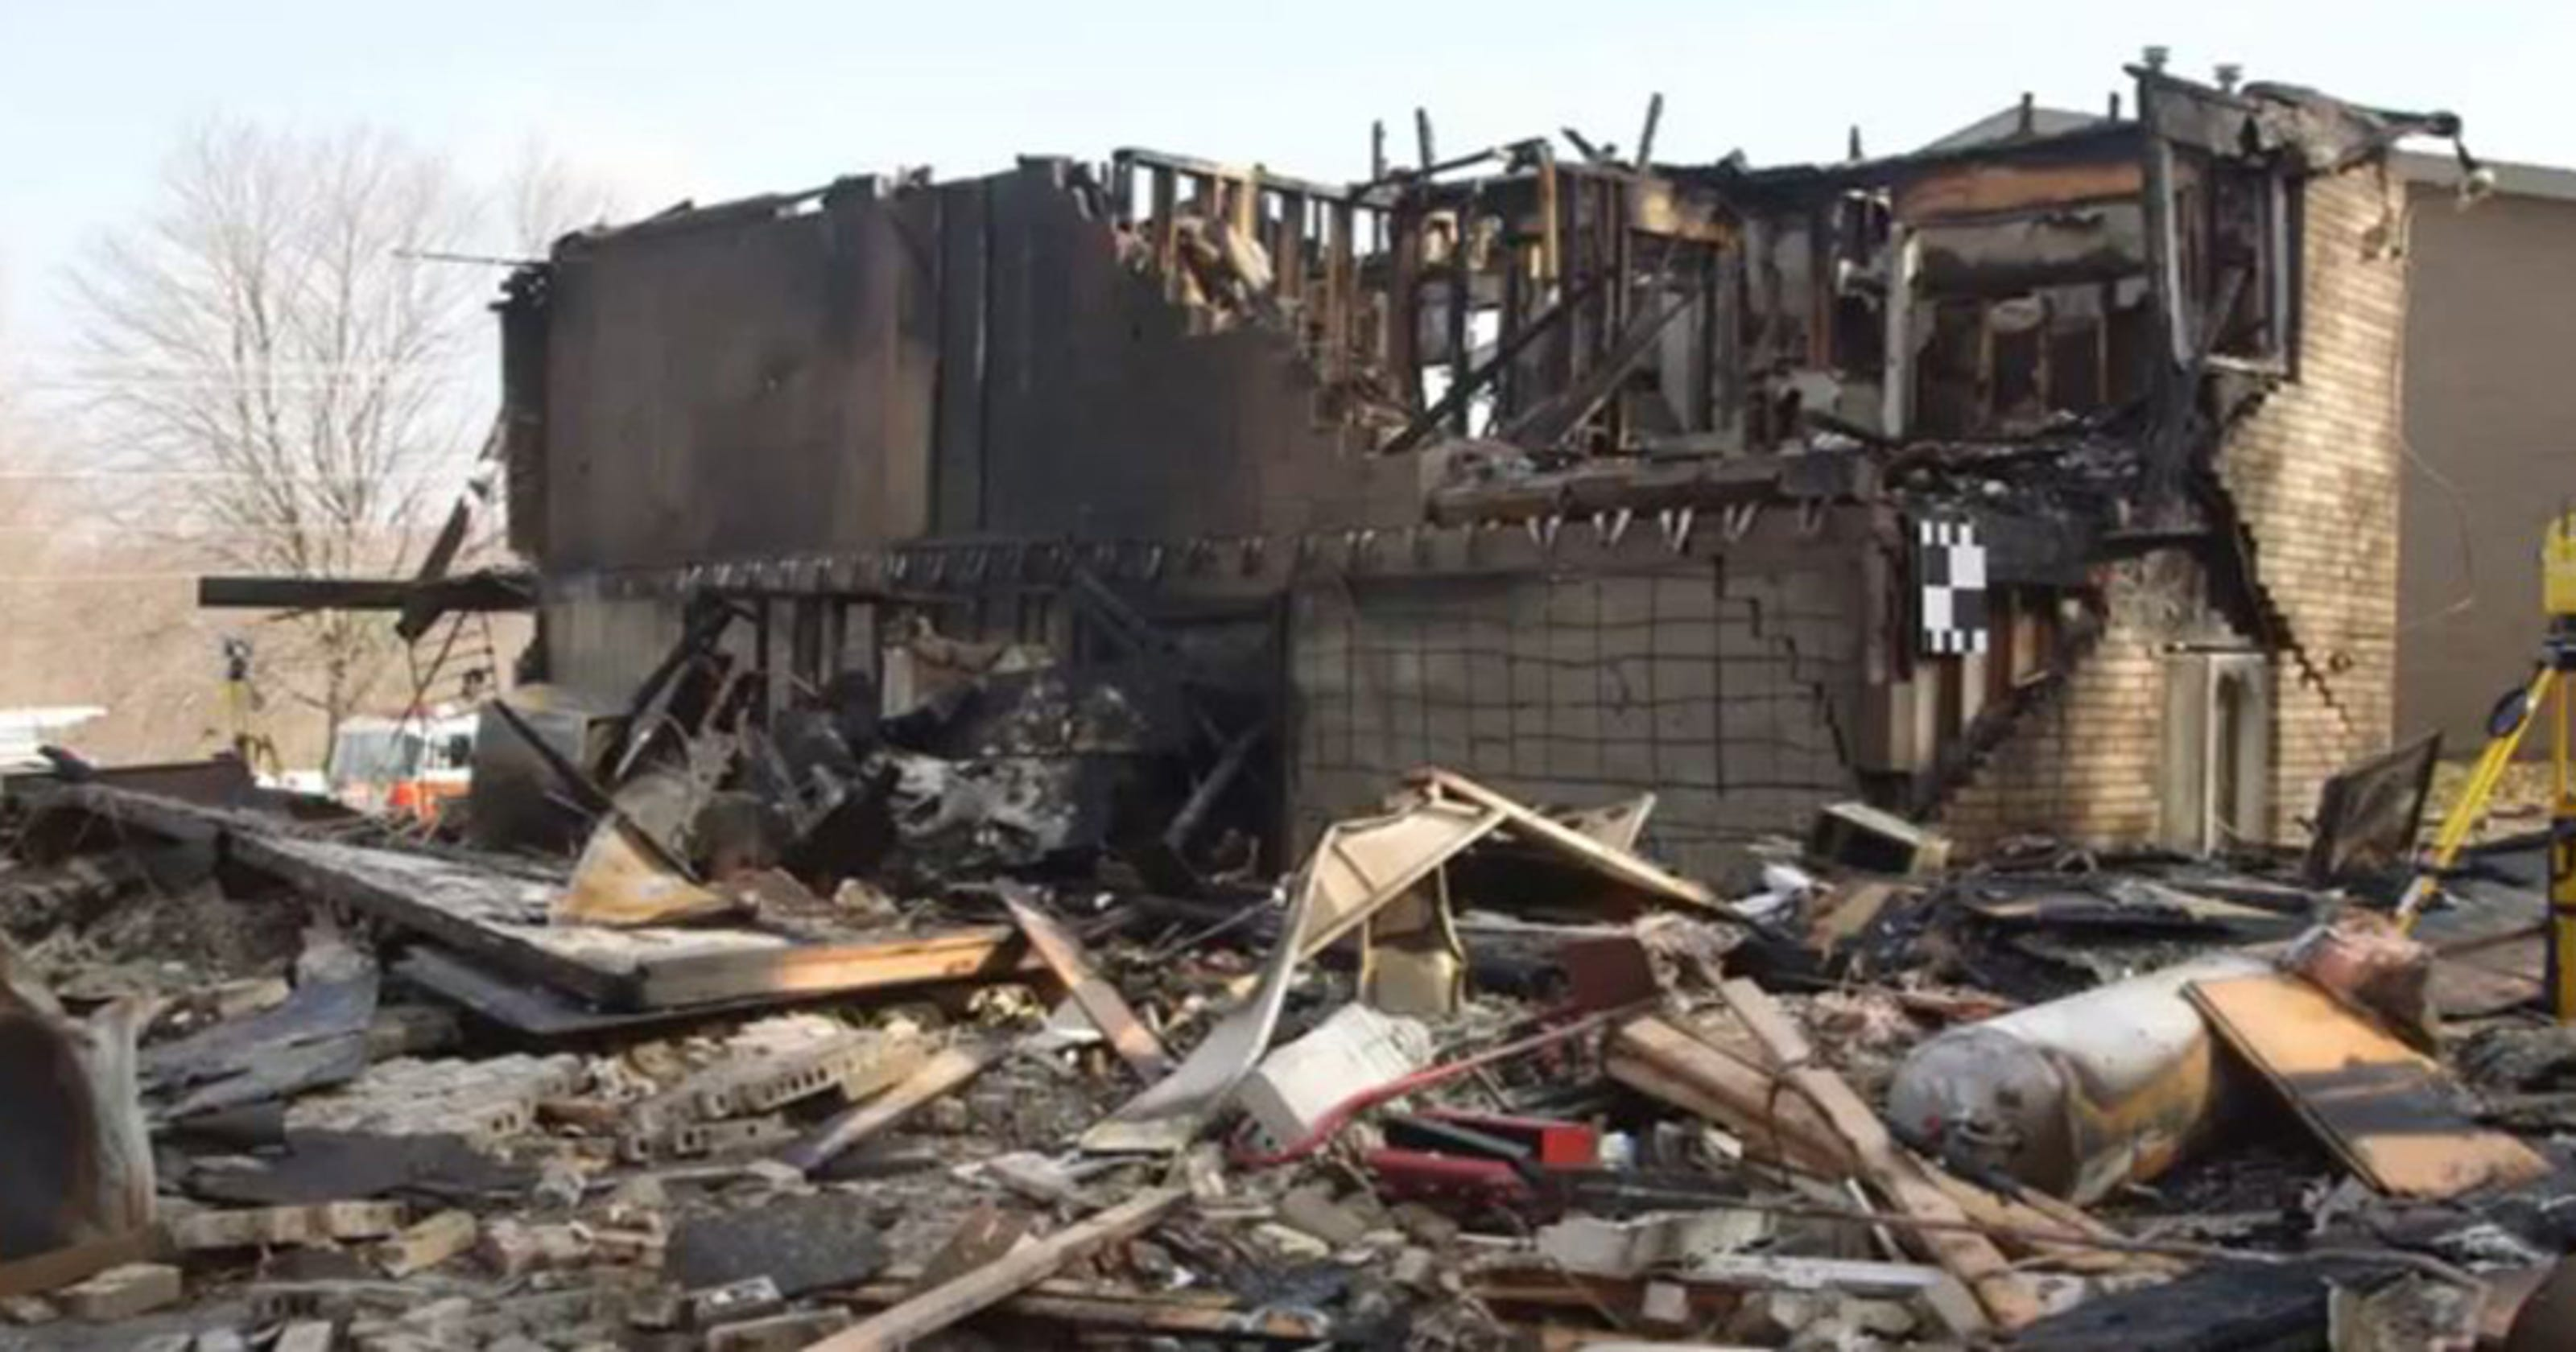 Surveillance Video Shows Ohio Plane Crash Crashed Aircraft Beacon